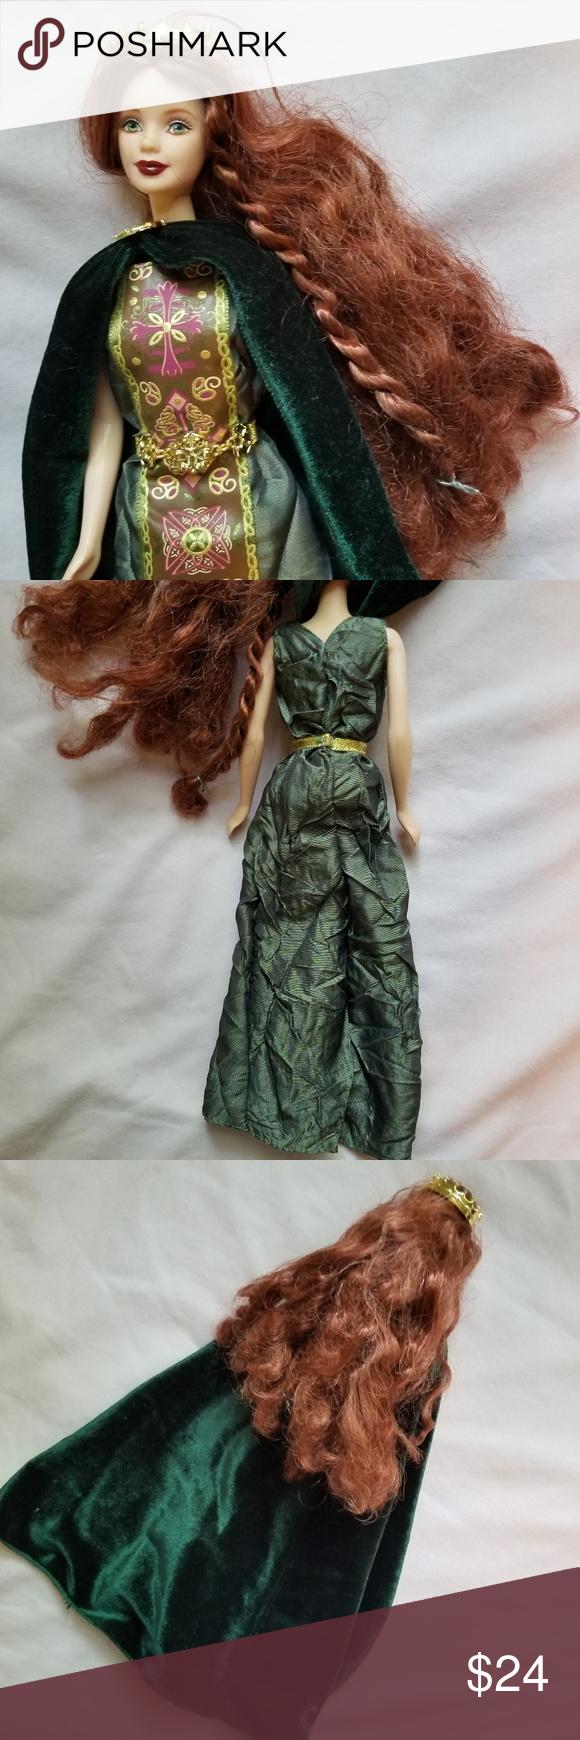 Green dress on pale skin  Princess of Ireland Barbie  Dolls of the World  Pinterest  Auburn